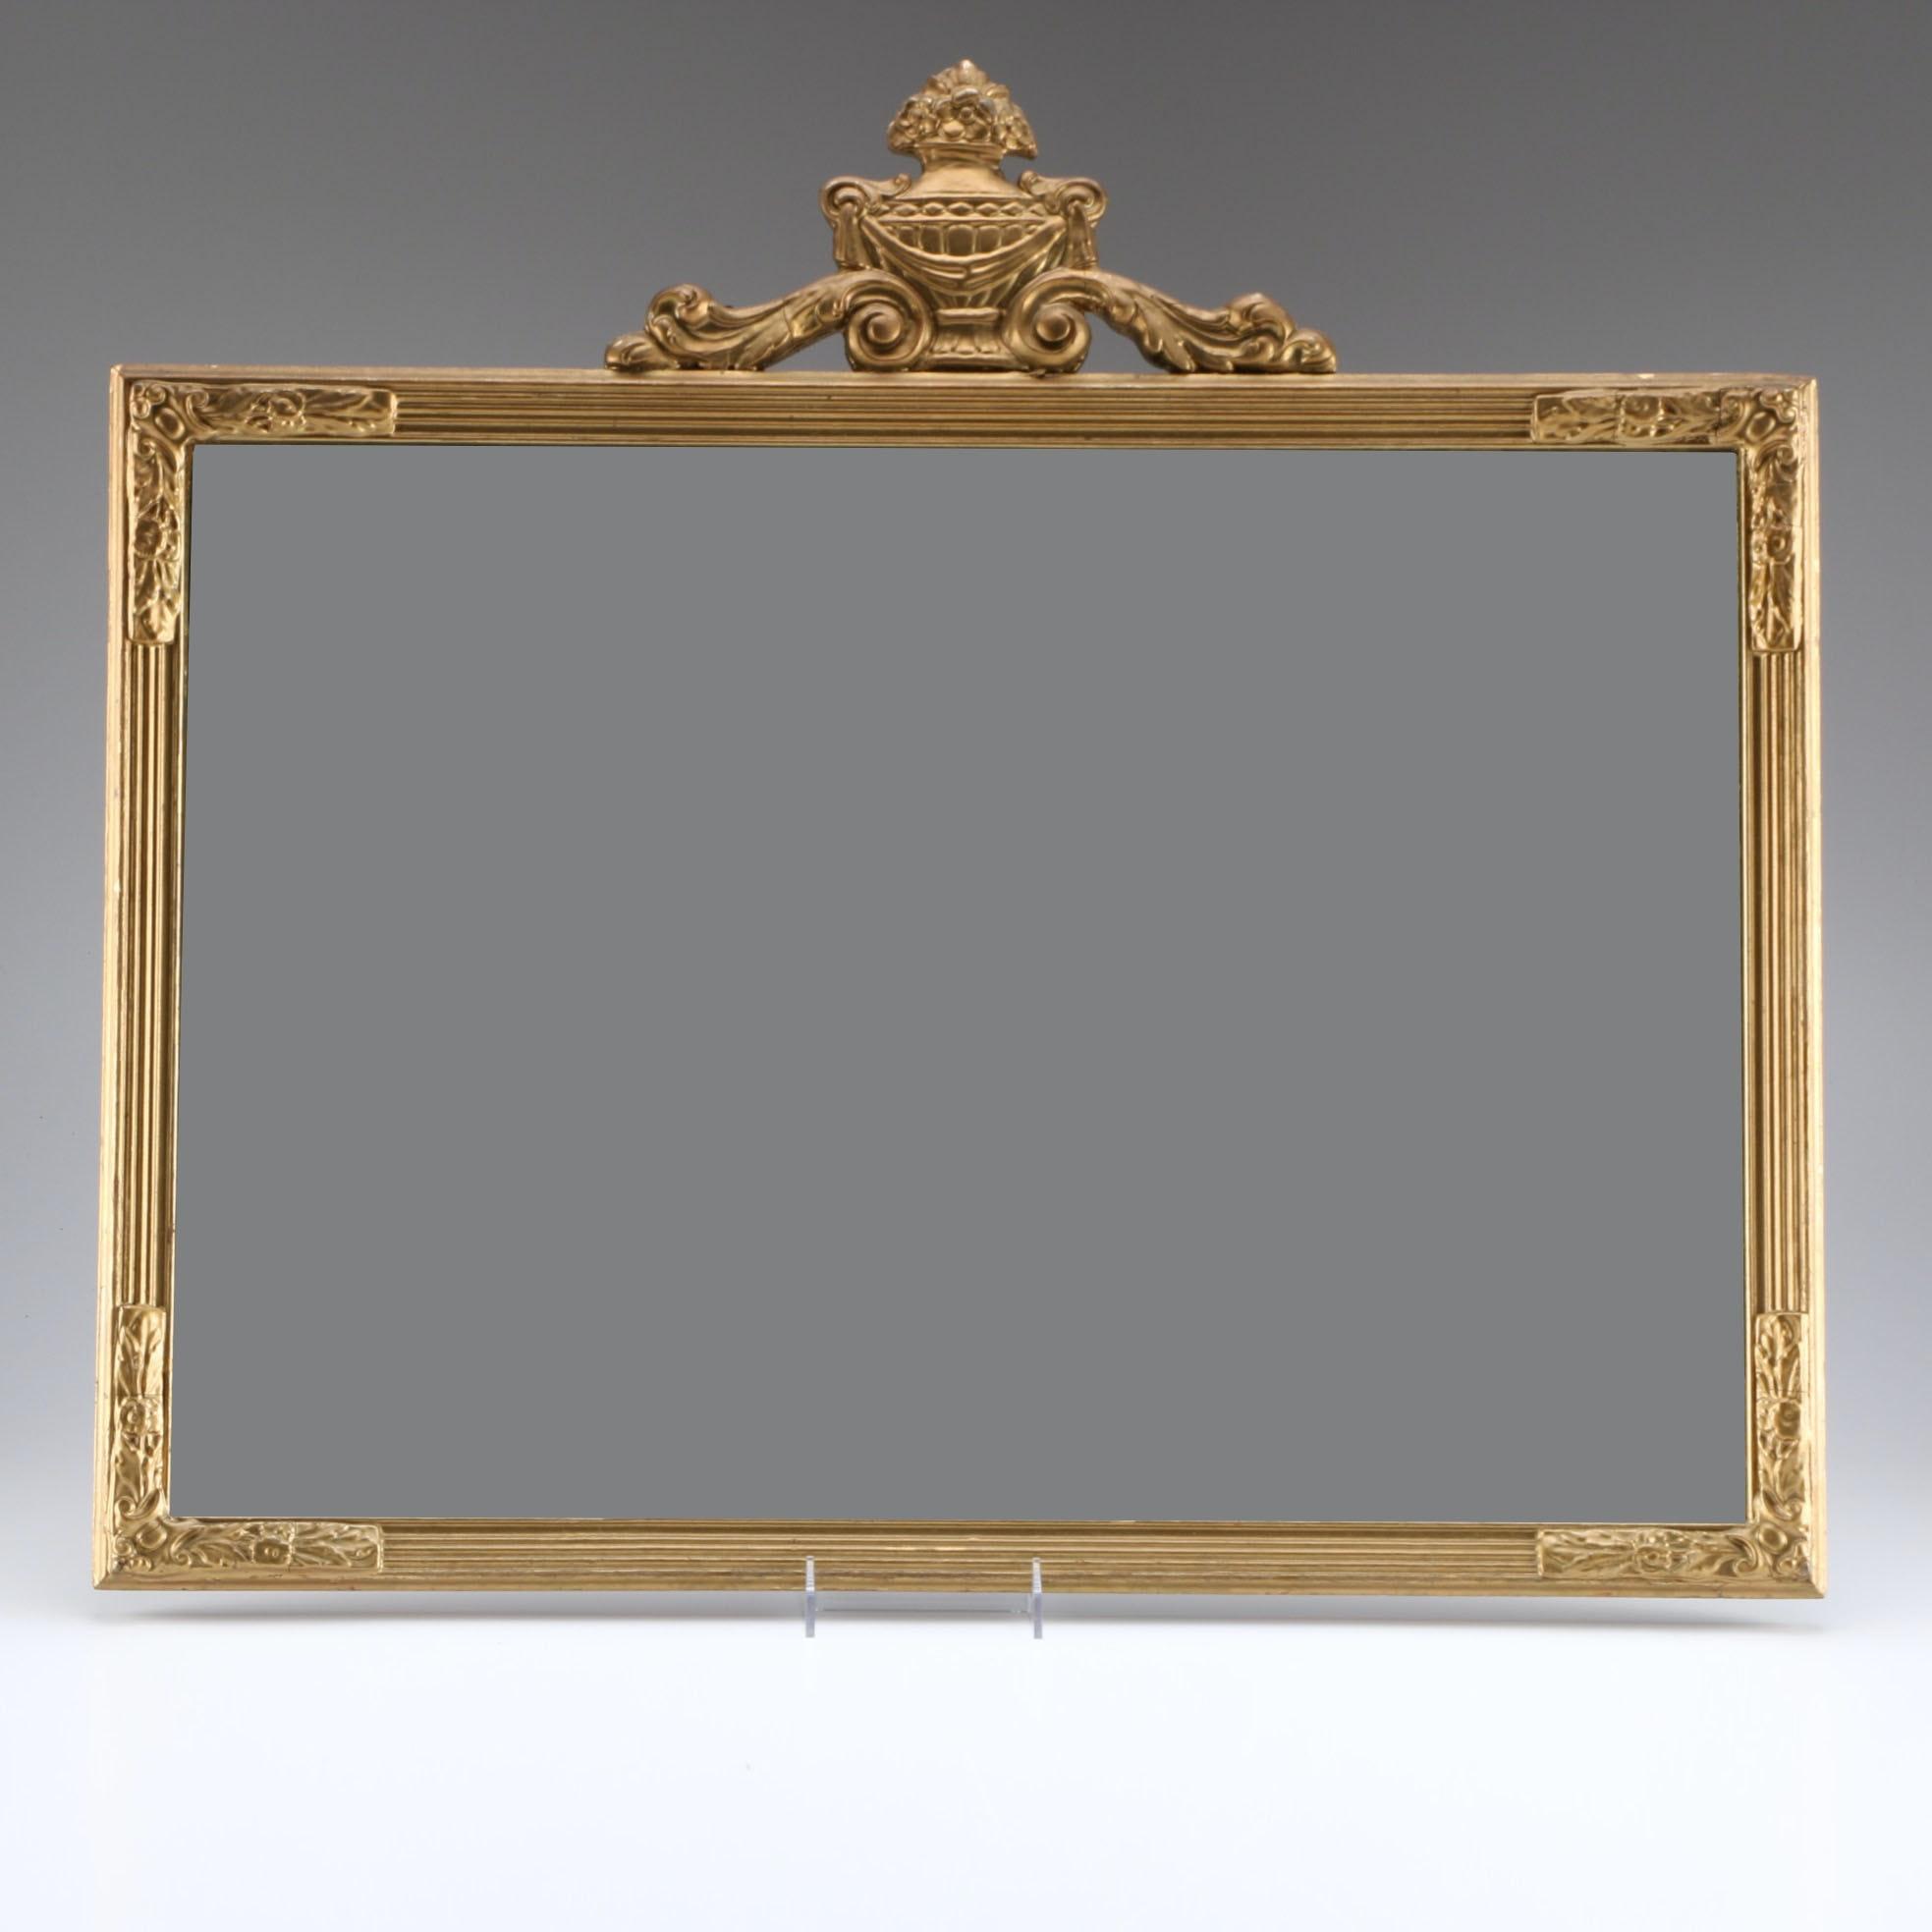 Regency Styled Framed Wall Mirror